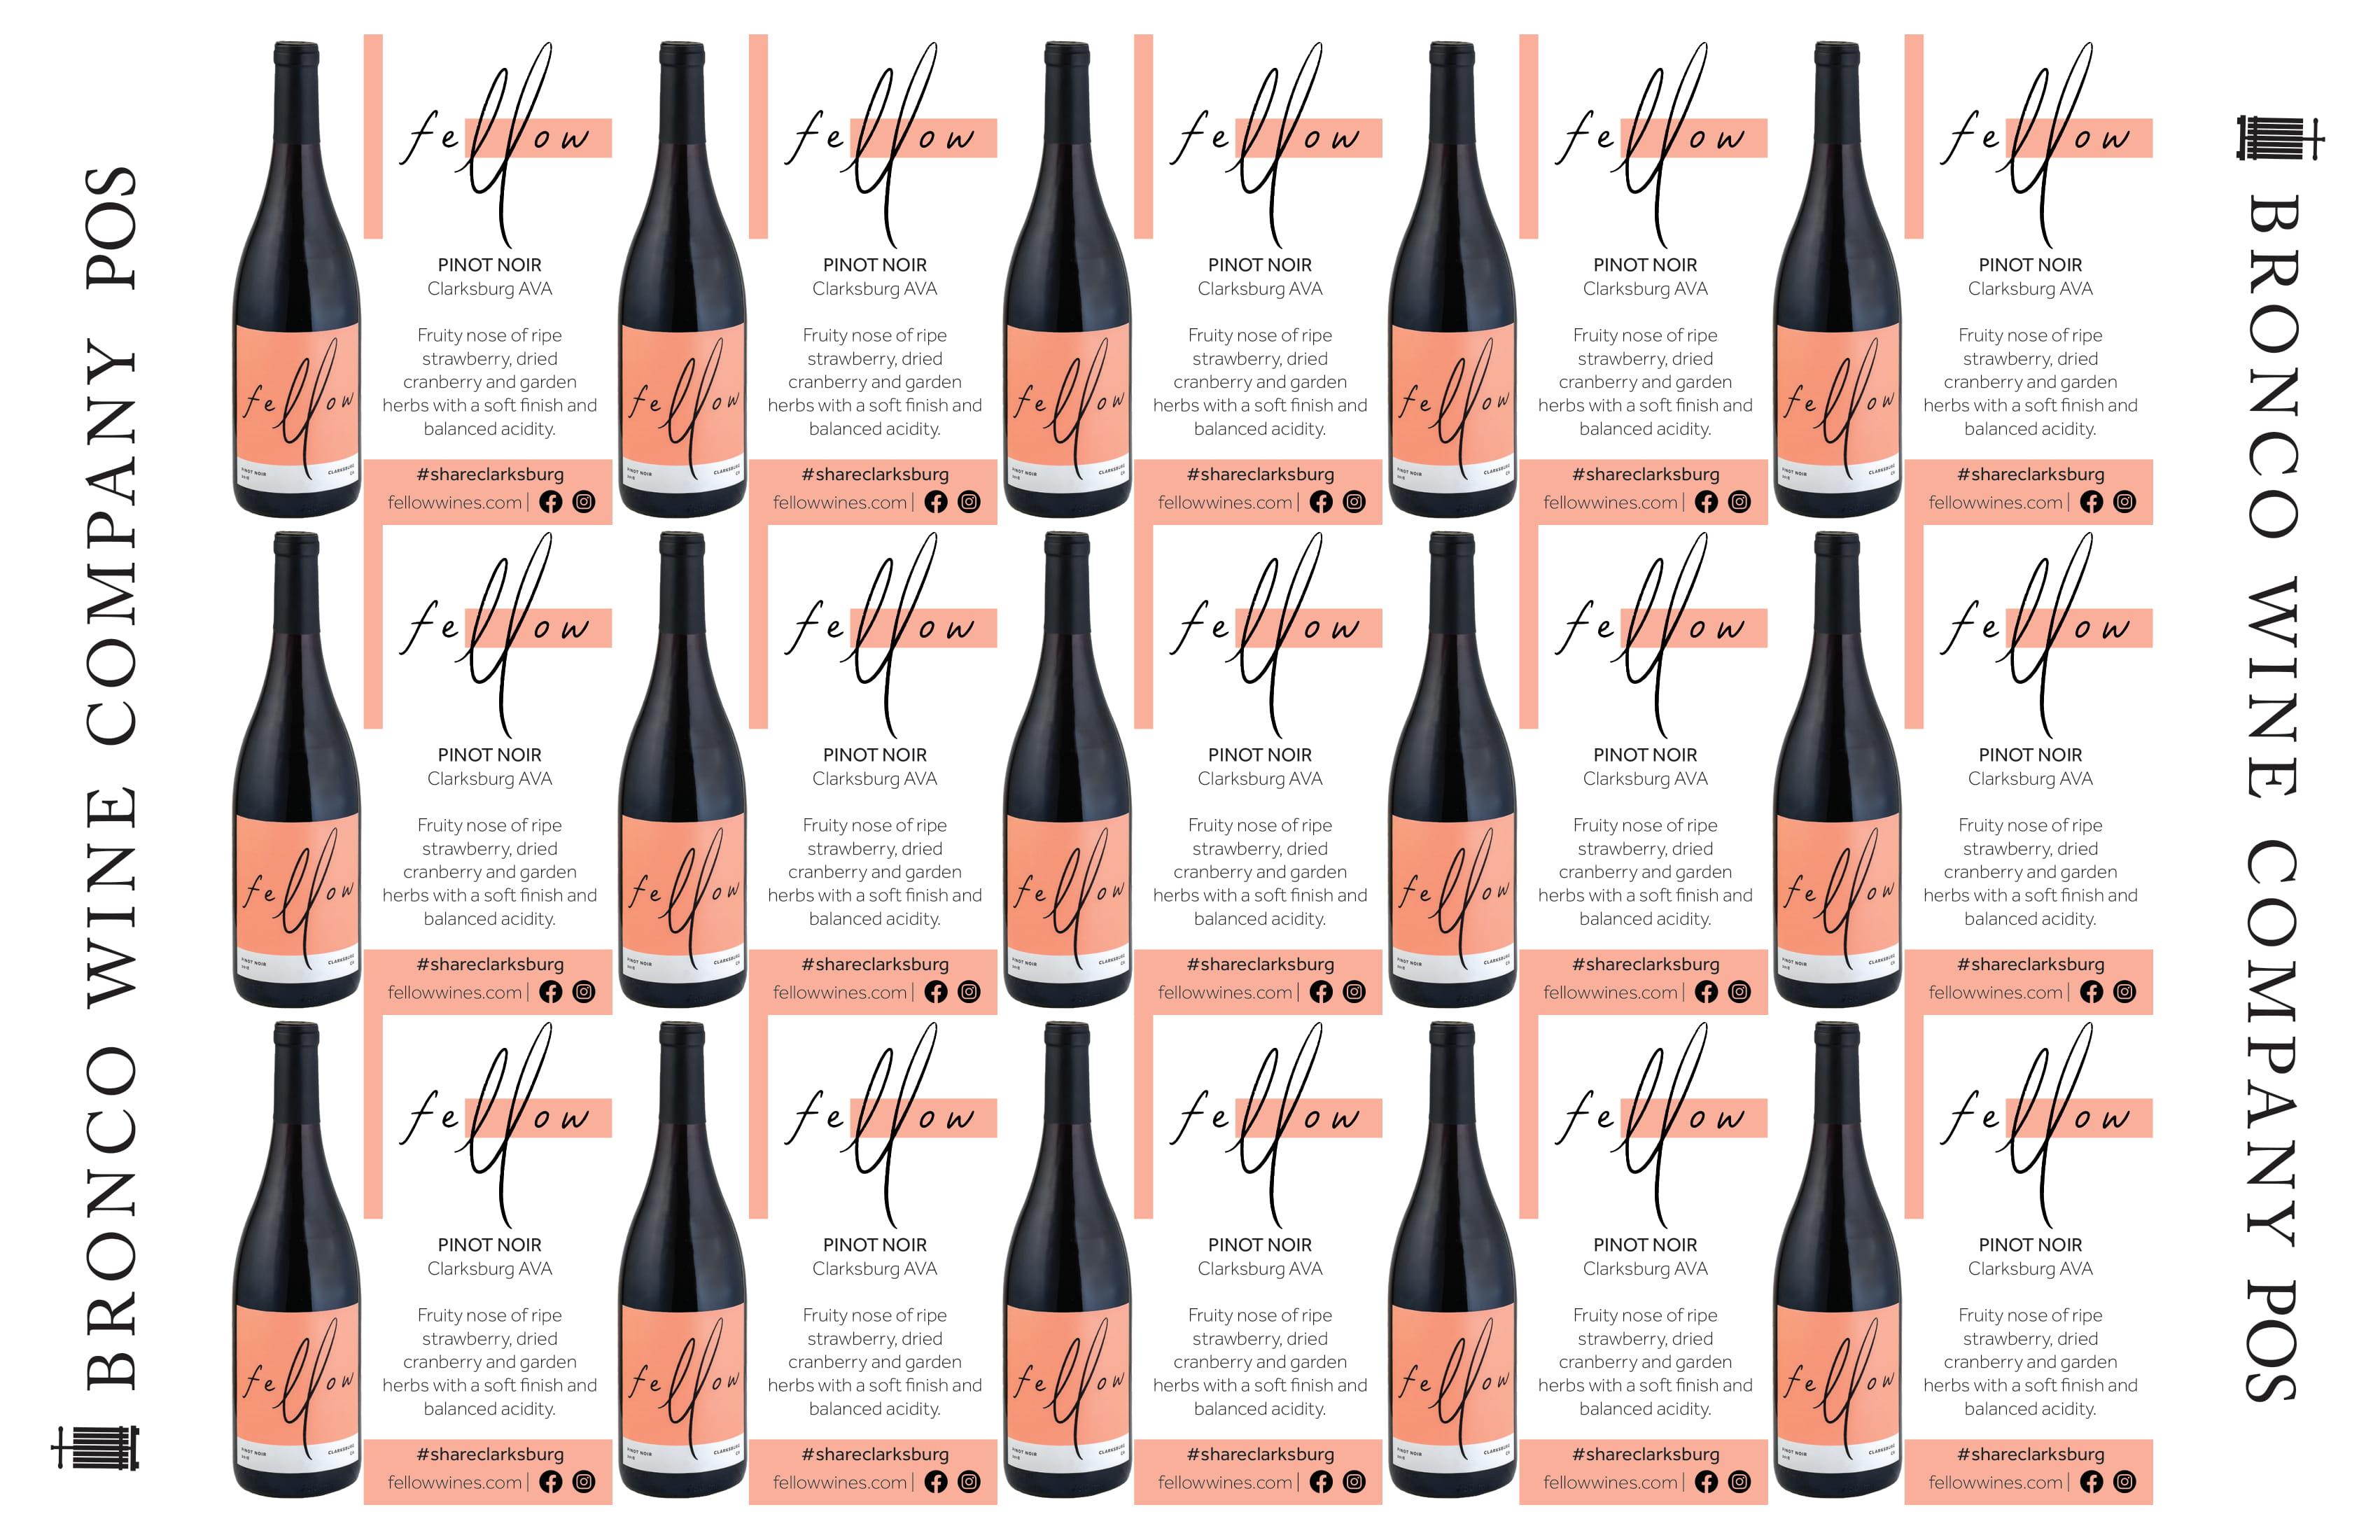 Fellow Wines Pinot Noir Shelf Talker